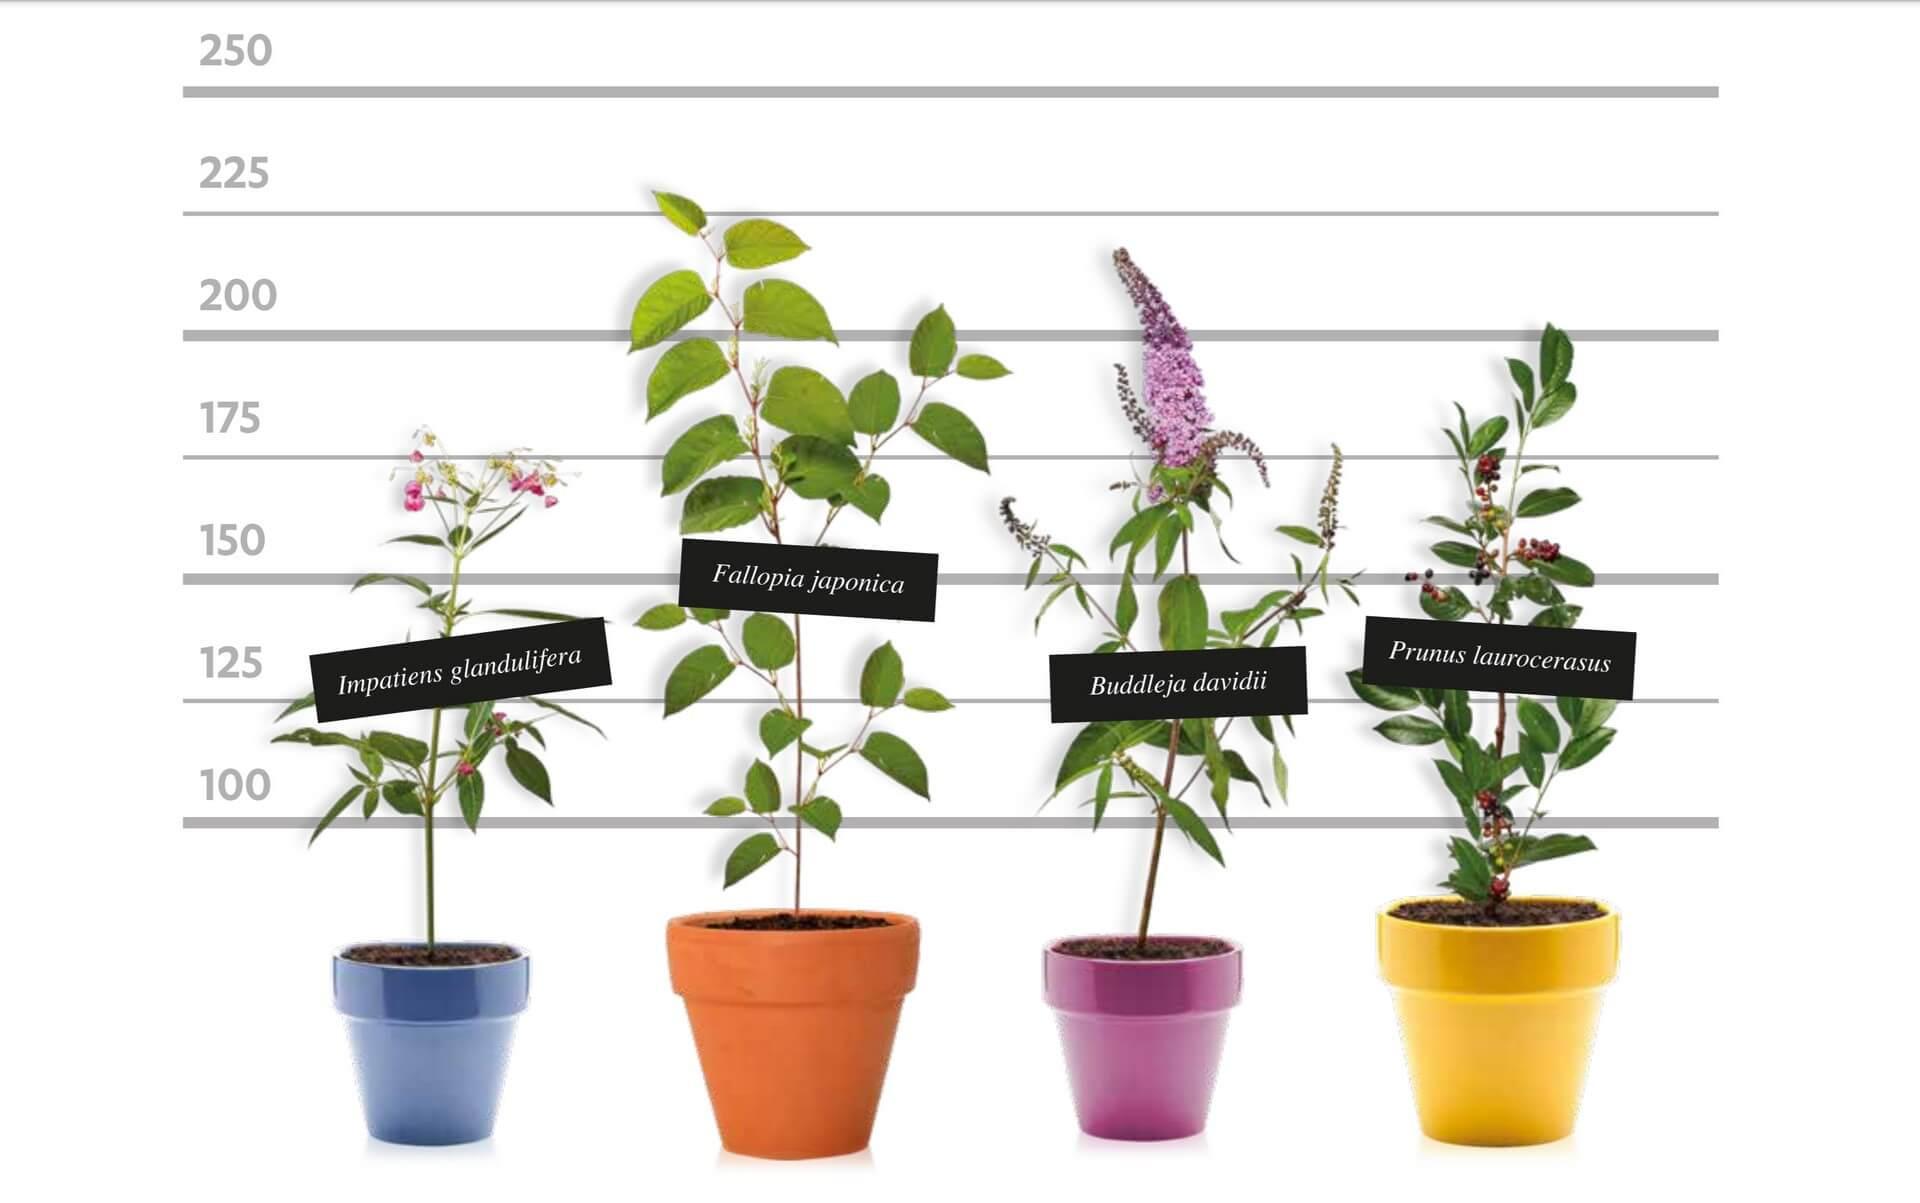 Obetaven projekt za koristno izrabo invazivnih tujerodnih rastlin